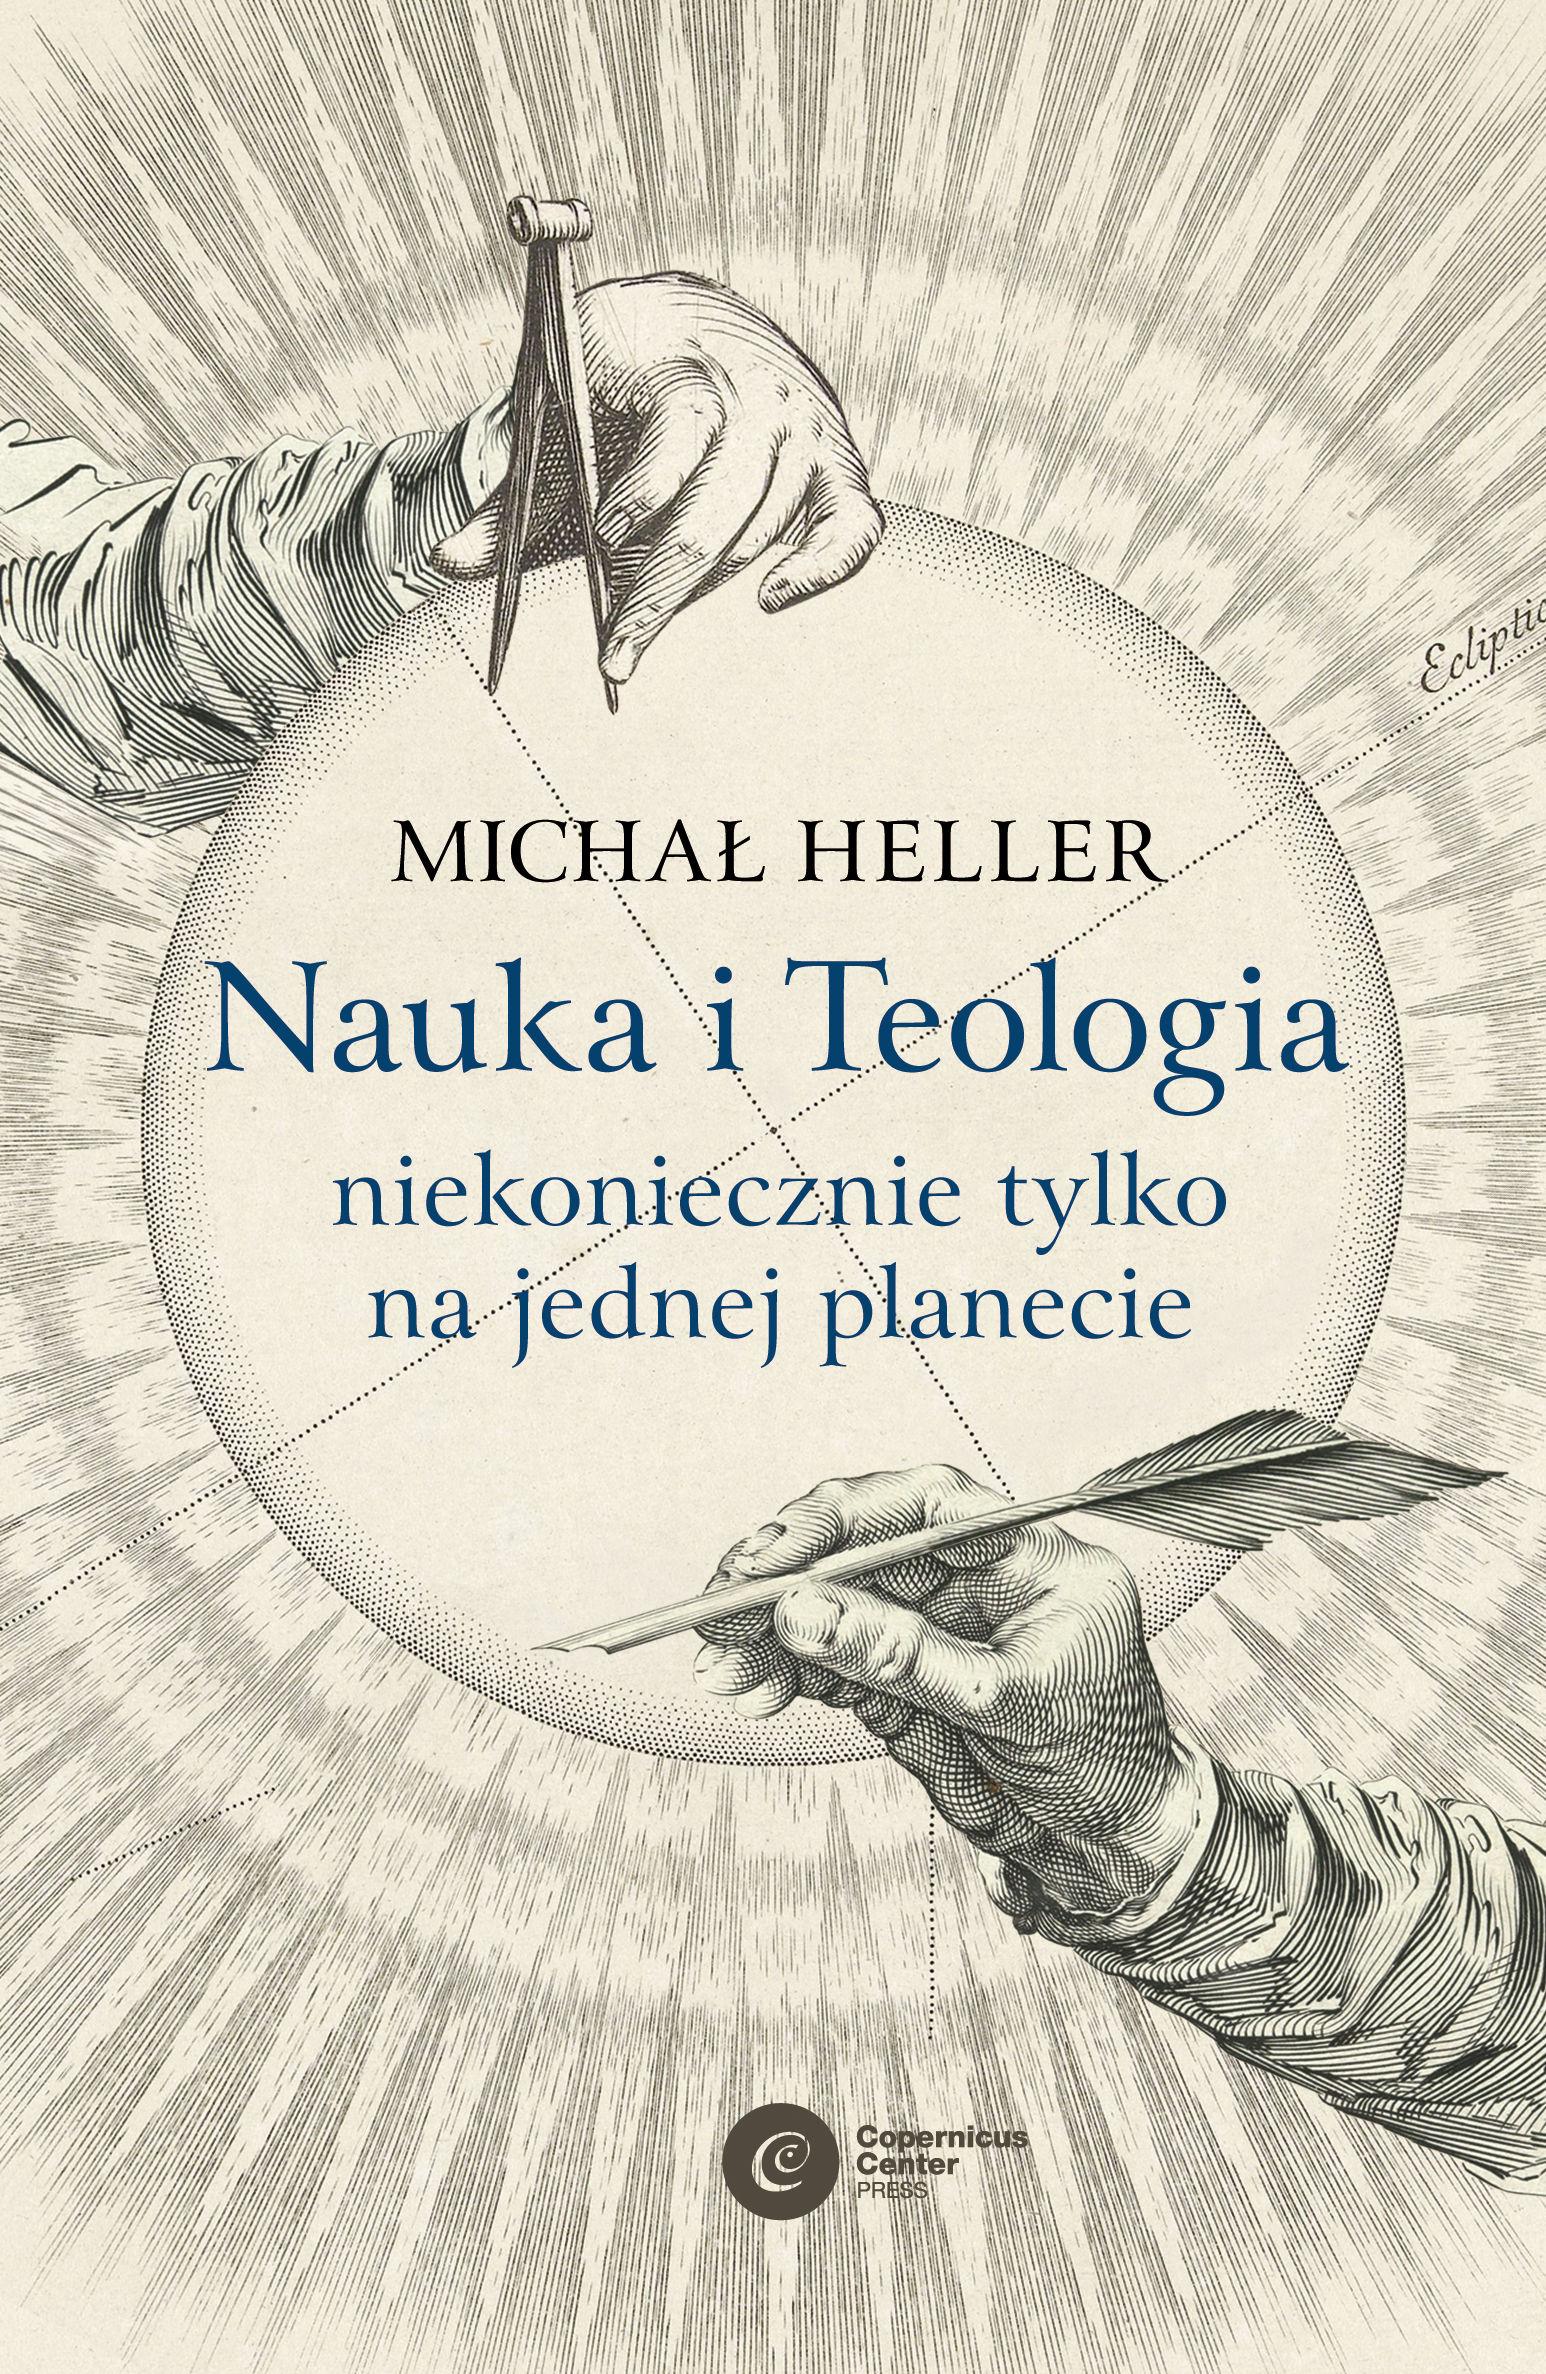 Nauka i Teologia  niekoniecznie tylko na jednej planecie - Michał Heller - ebook